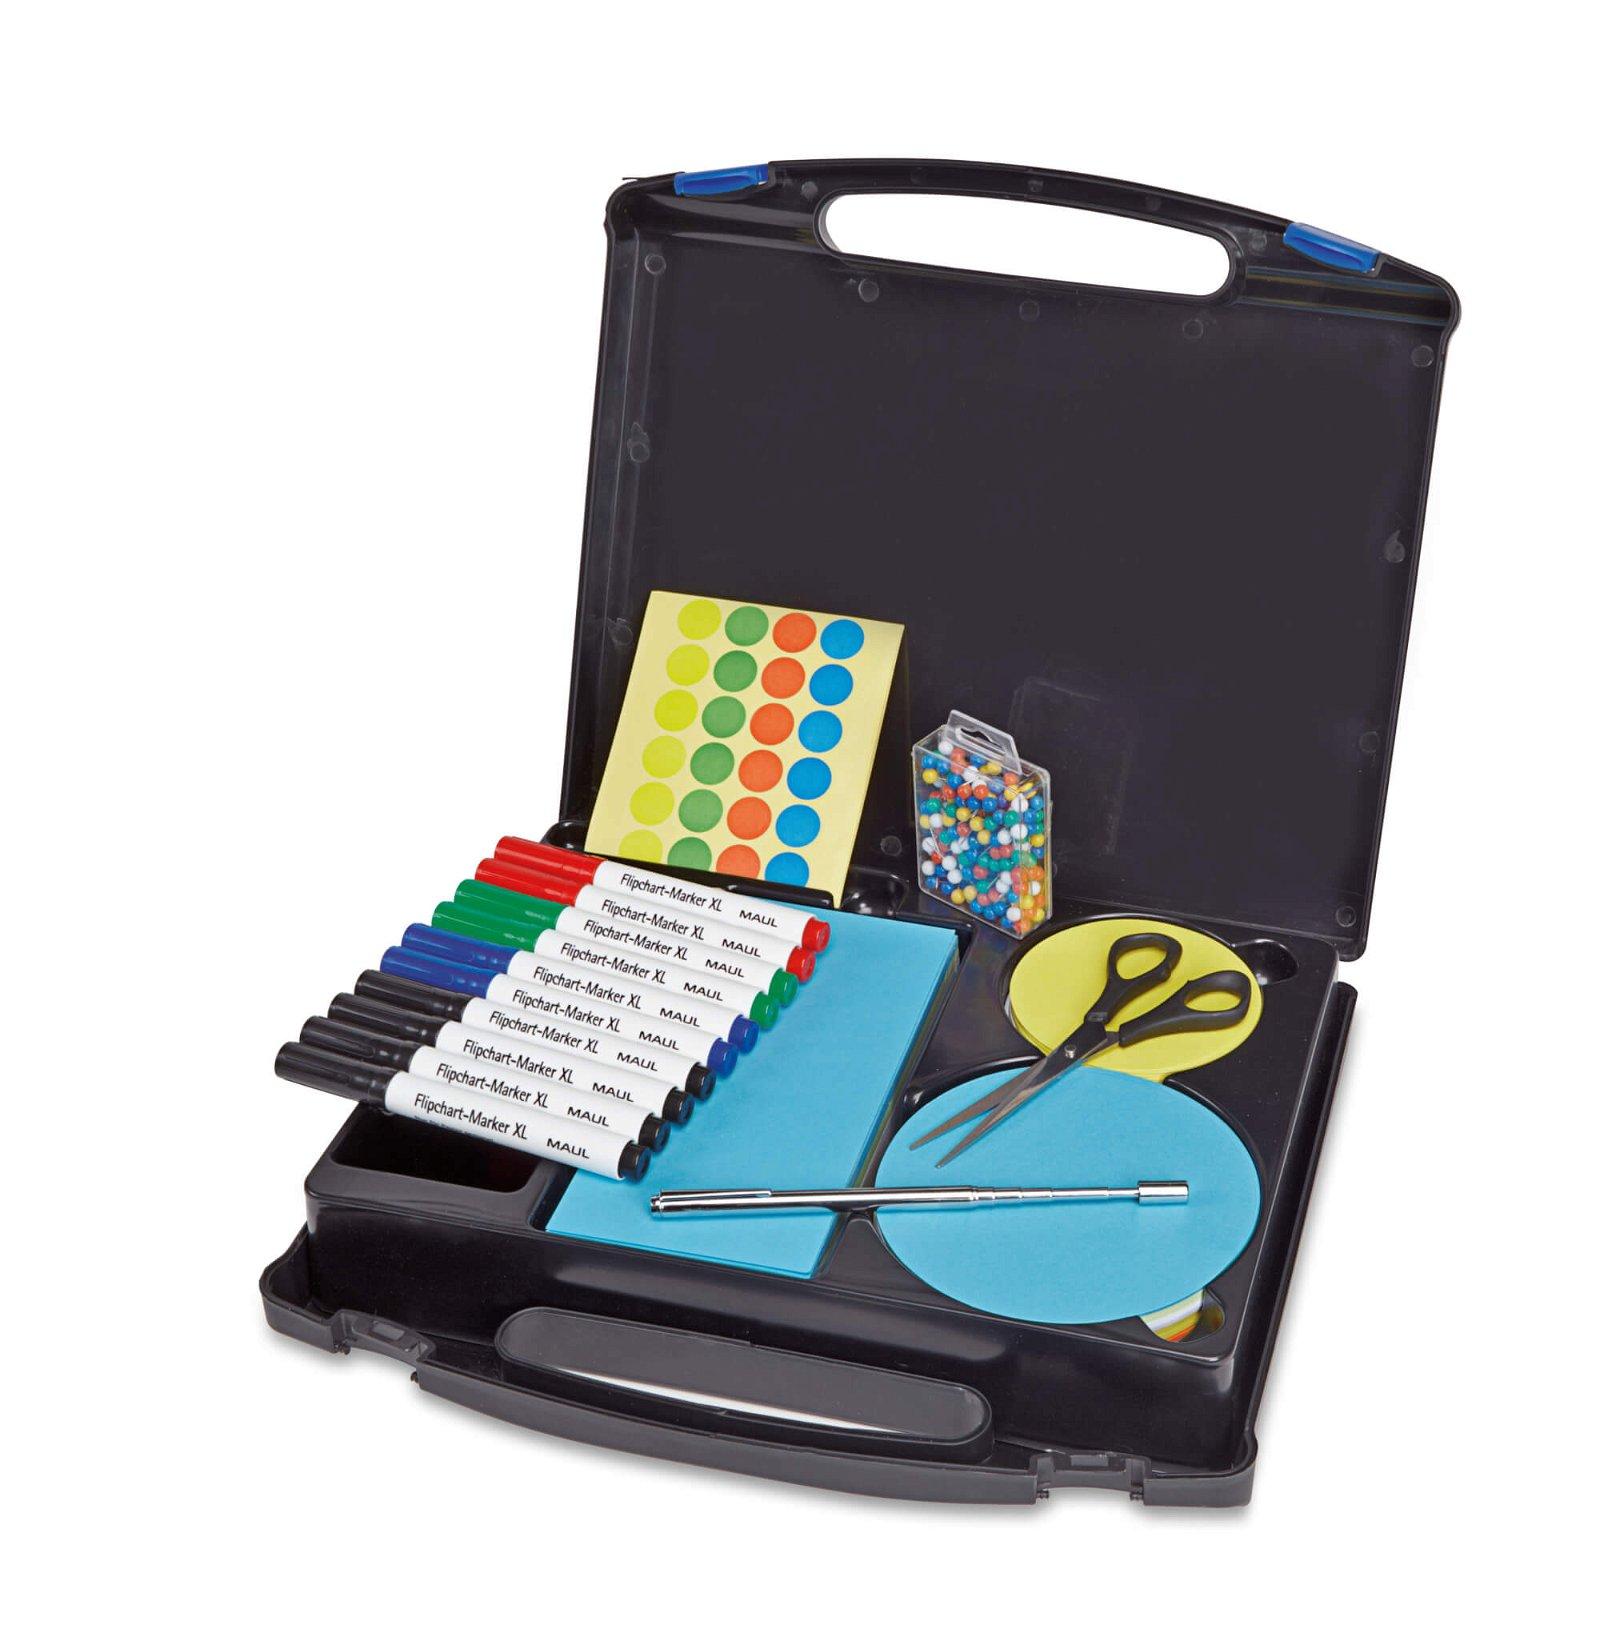 Moderatorenkoffer, Kunststoff, farbig sortiert